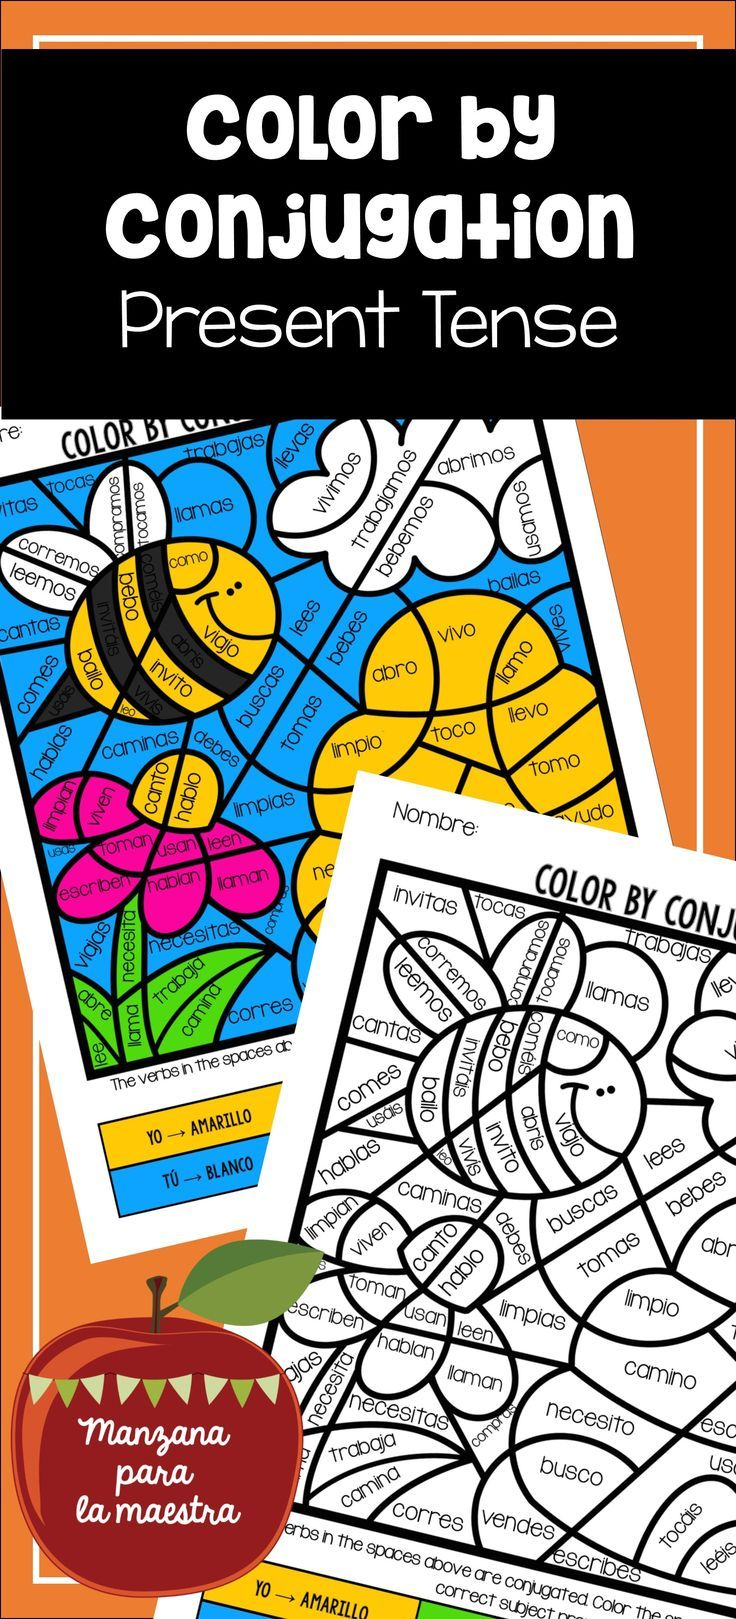 Spanish Conjugation Coloring Regular Present Tense Verbs Lesson Fun Activity Verbs Activities Verbs Lessons Present Tense Spanish [ 1619 x 736 Pixel ]